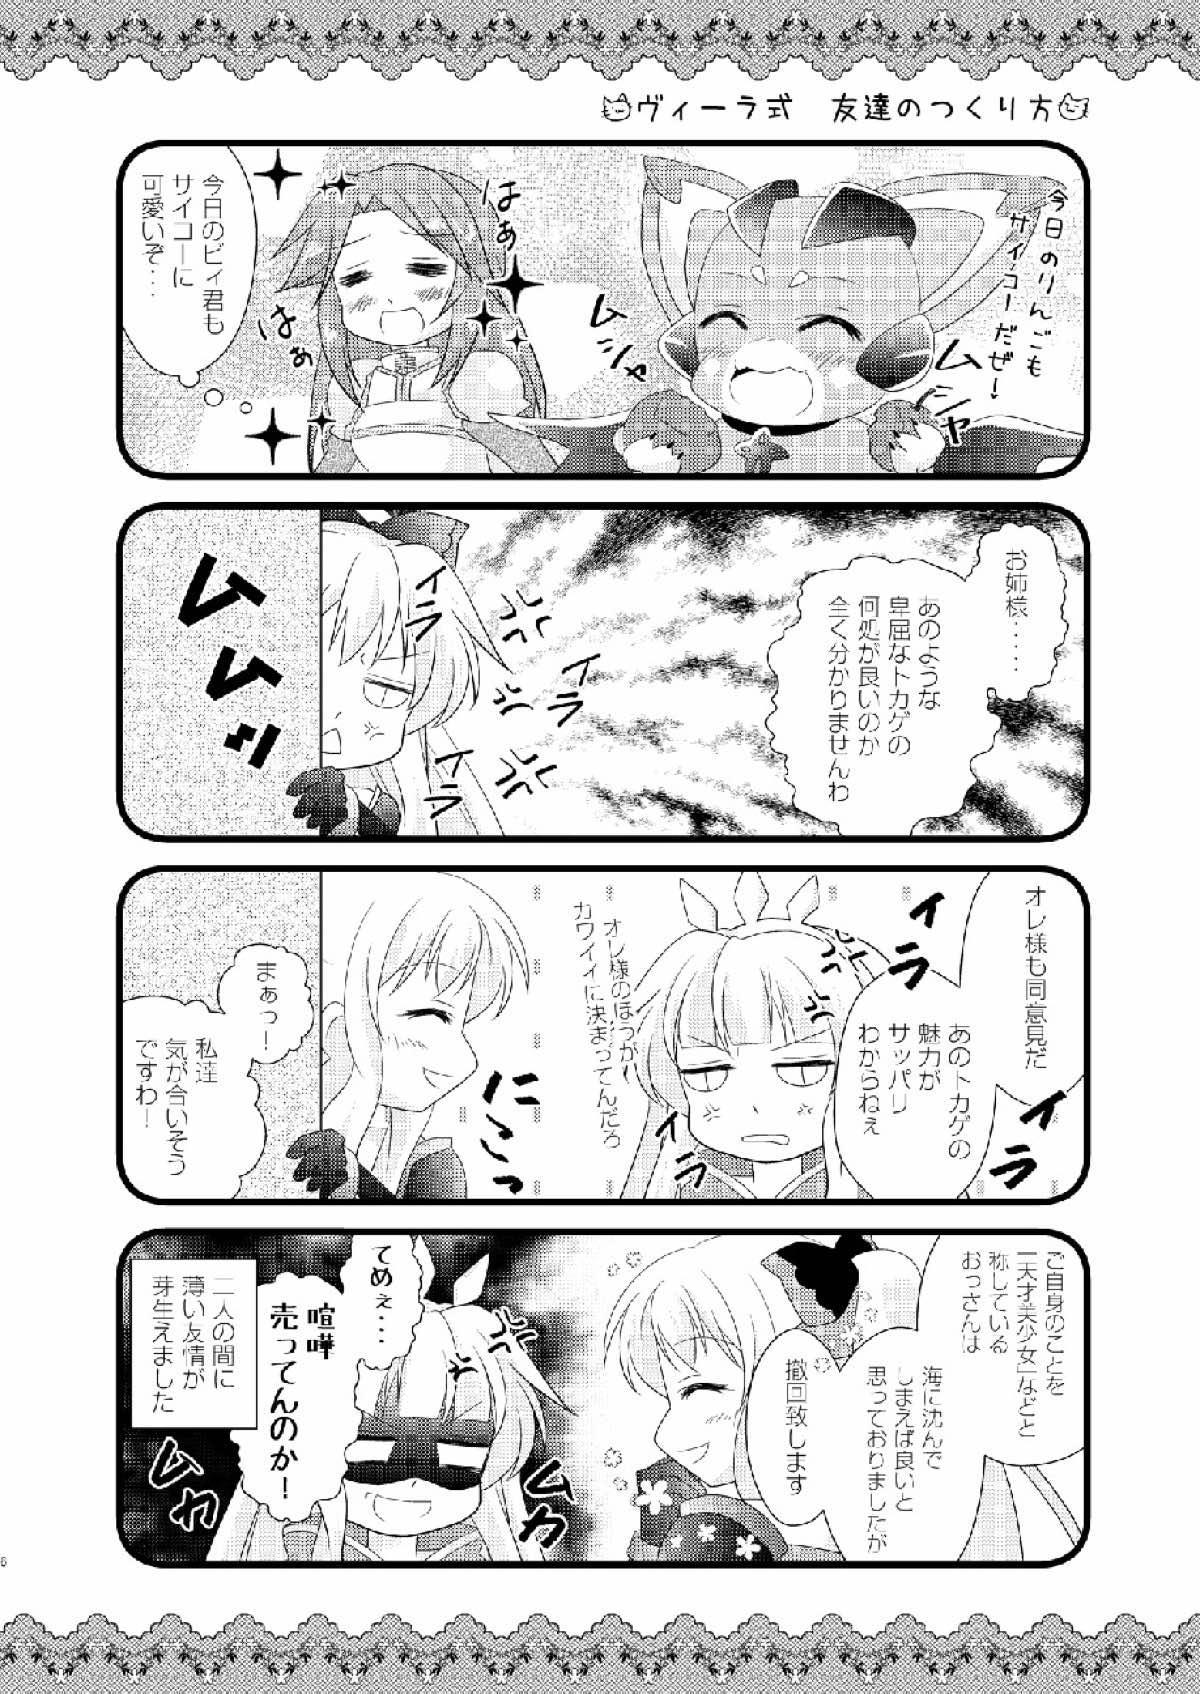 Strawberry Milk Vol. 10 4